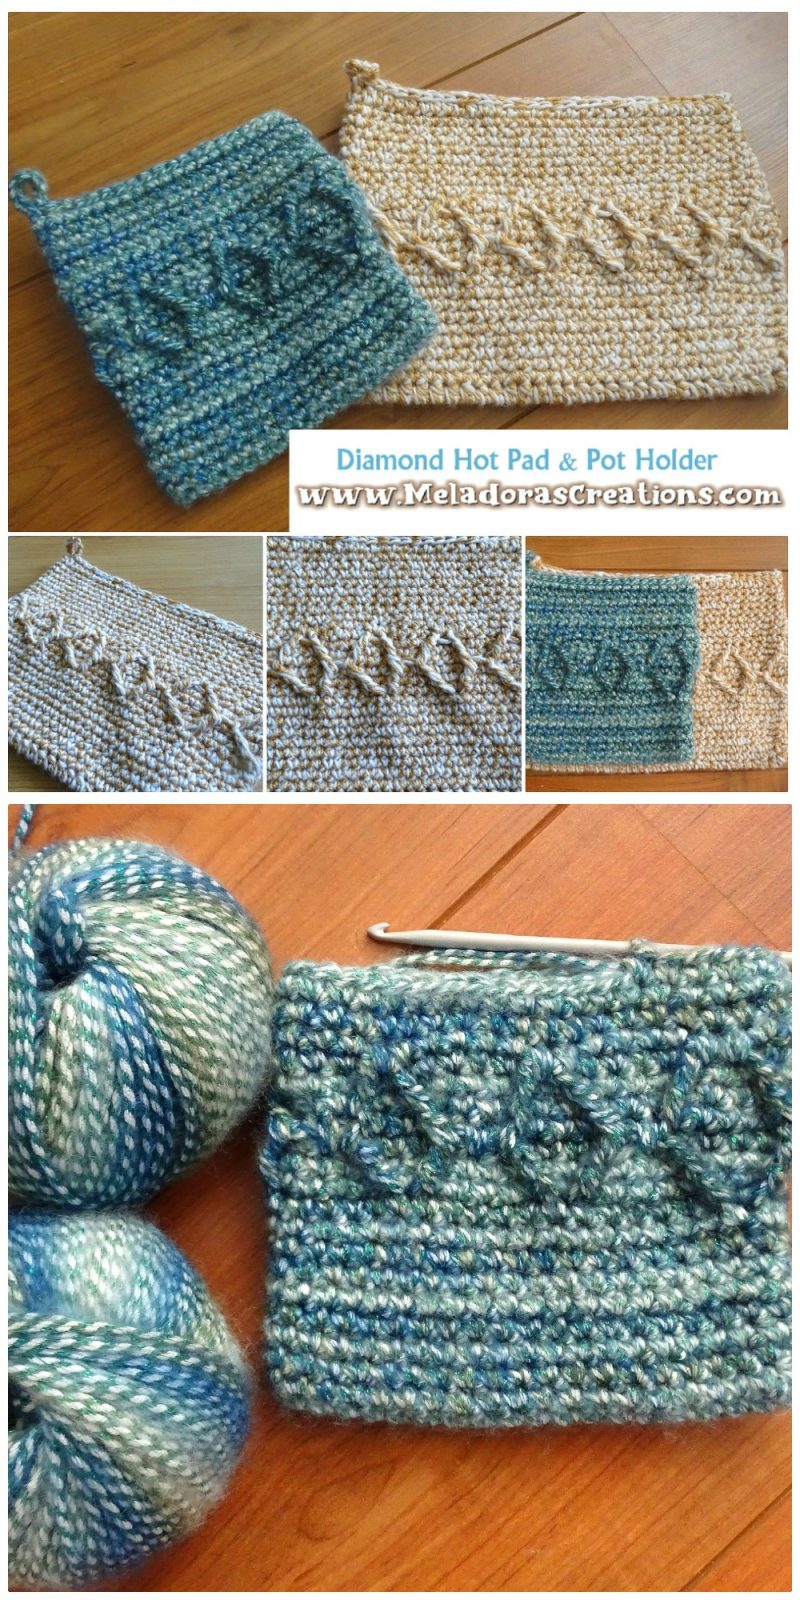 Crochet Pot Holder and Hot Pad Pattern – Diamond Crochet Pot holder - Free Crochet pattern